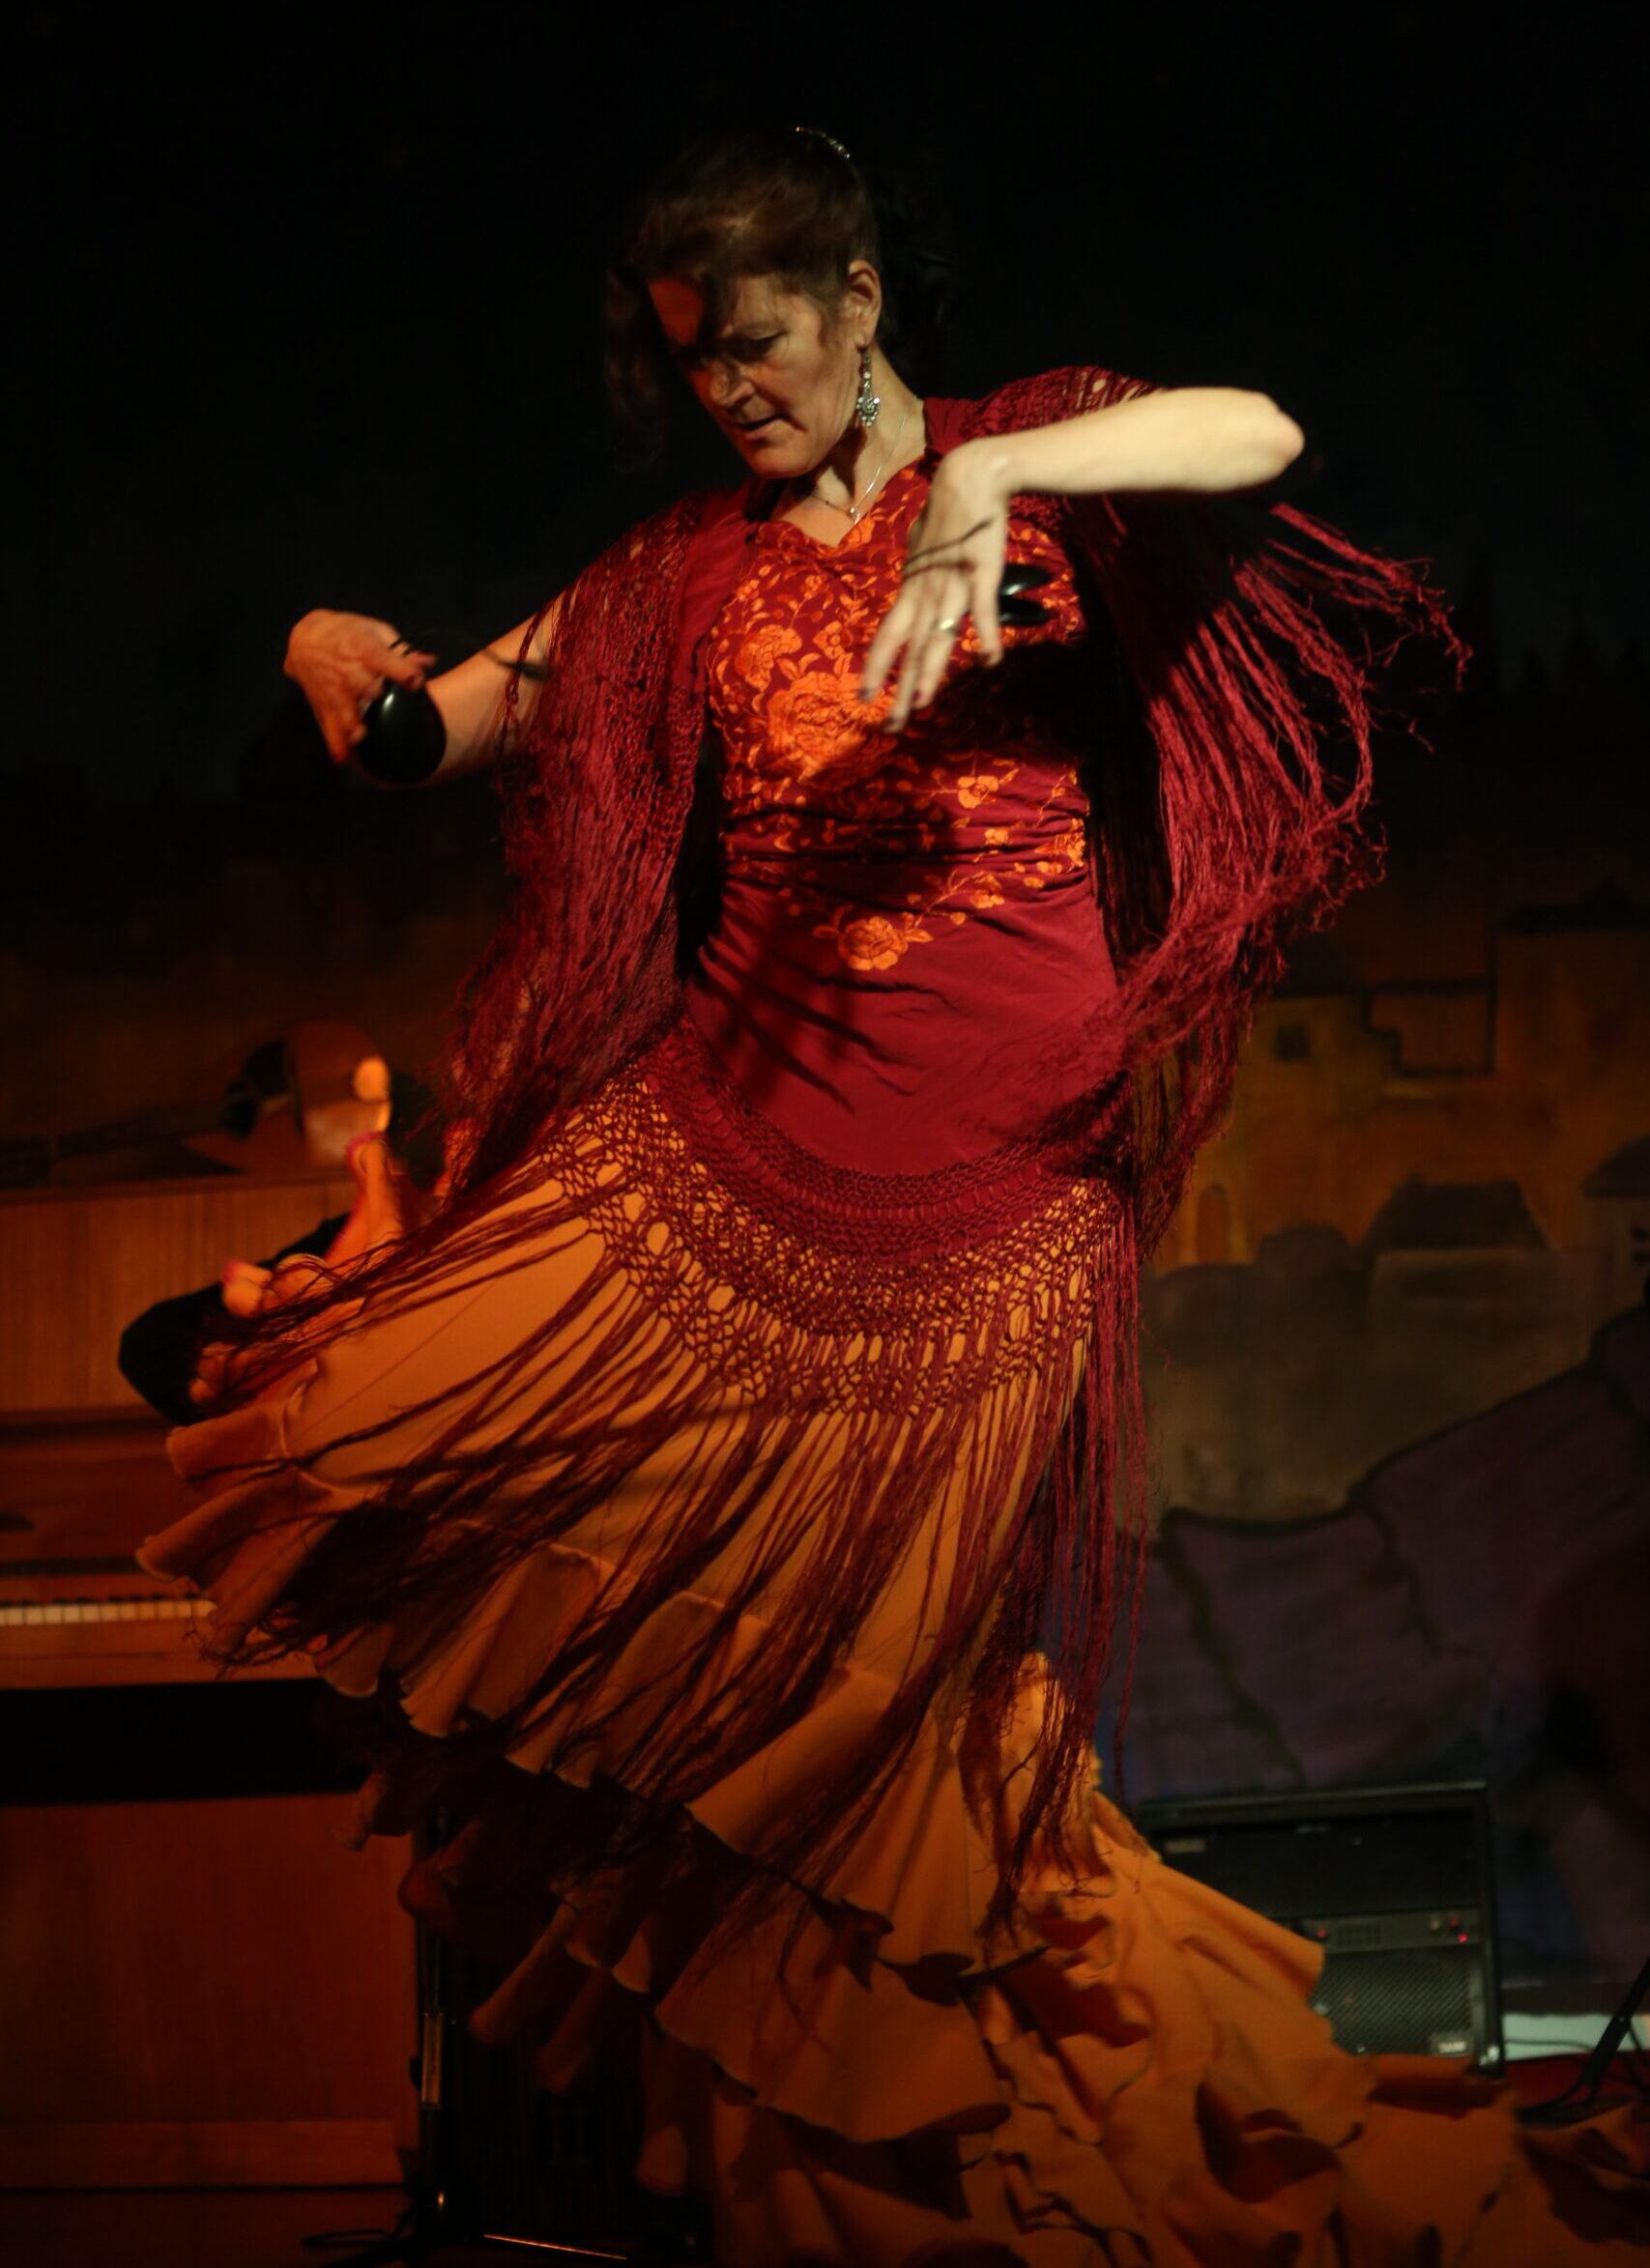 Ana Sojor